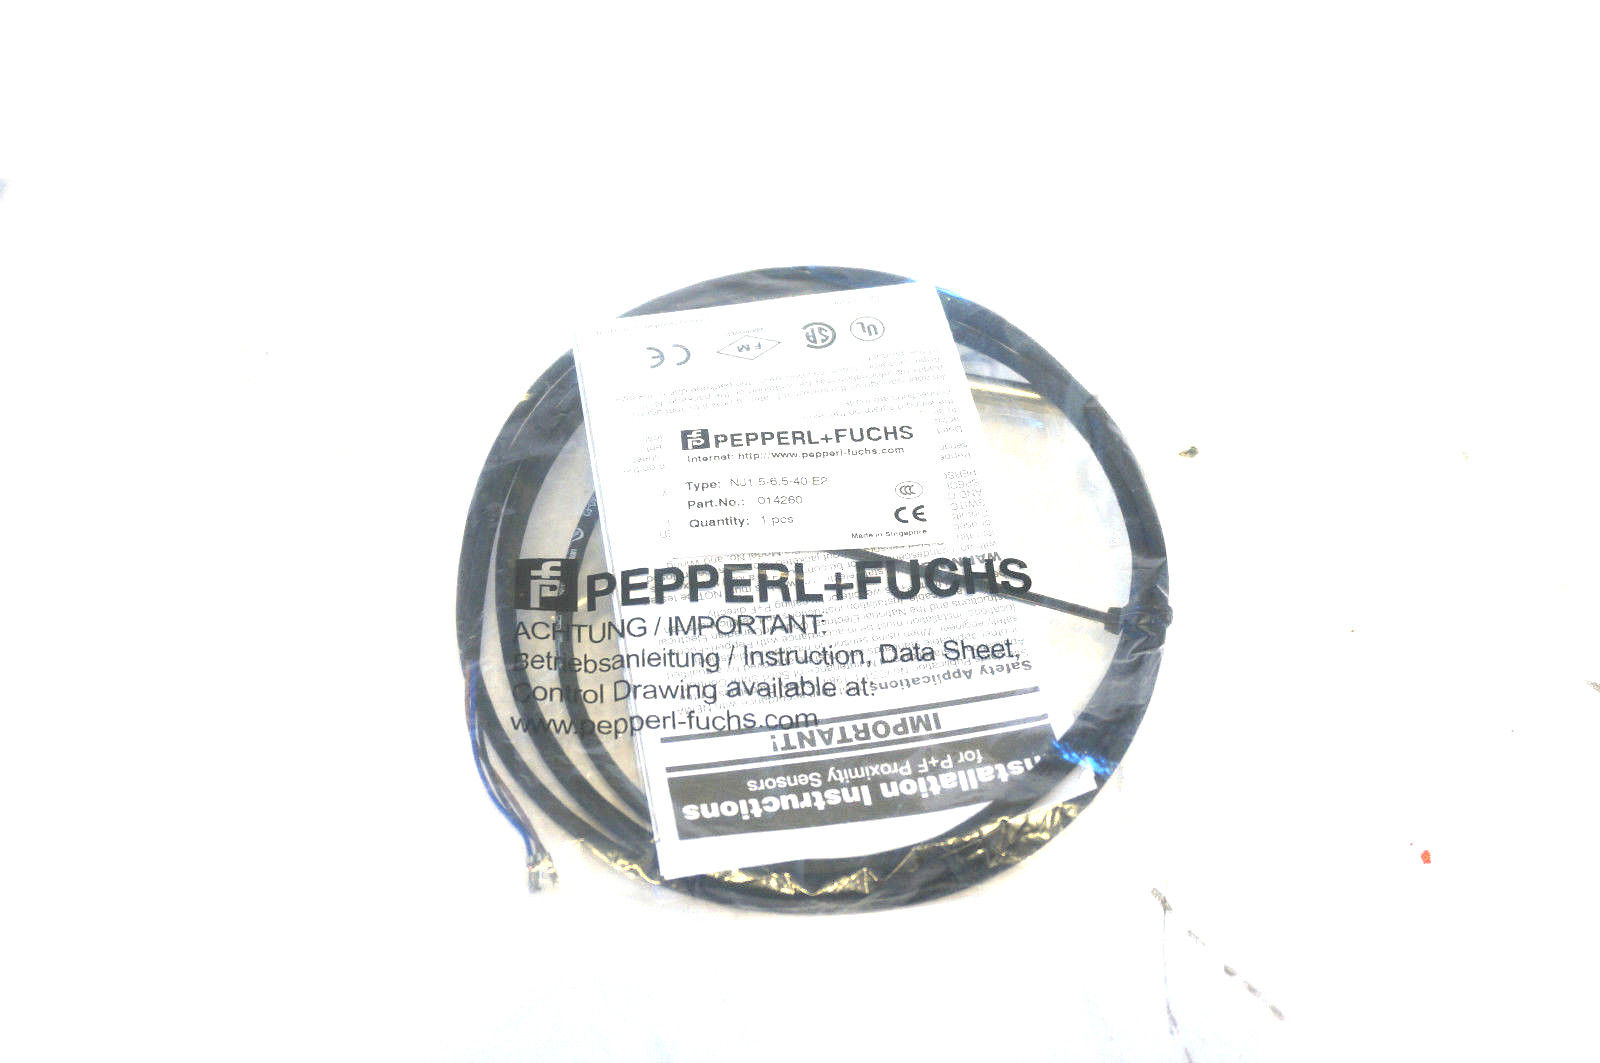 New Pepperl Amp Fuchs Nj1 5 6 5 40 E2 Inductive Sensor Nj E2 Sb Industrial Supply